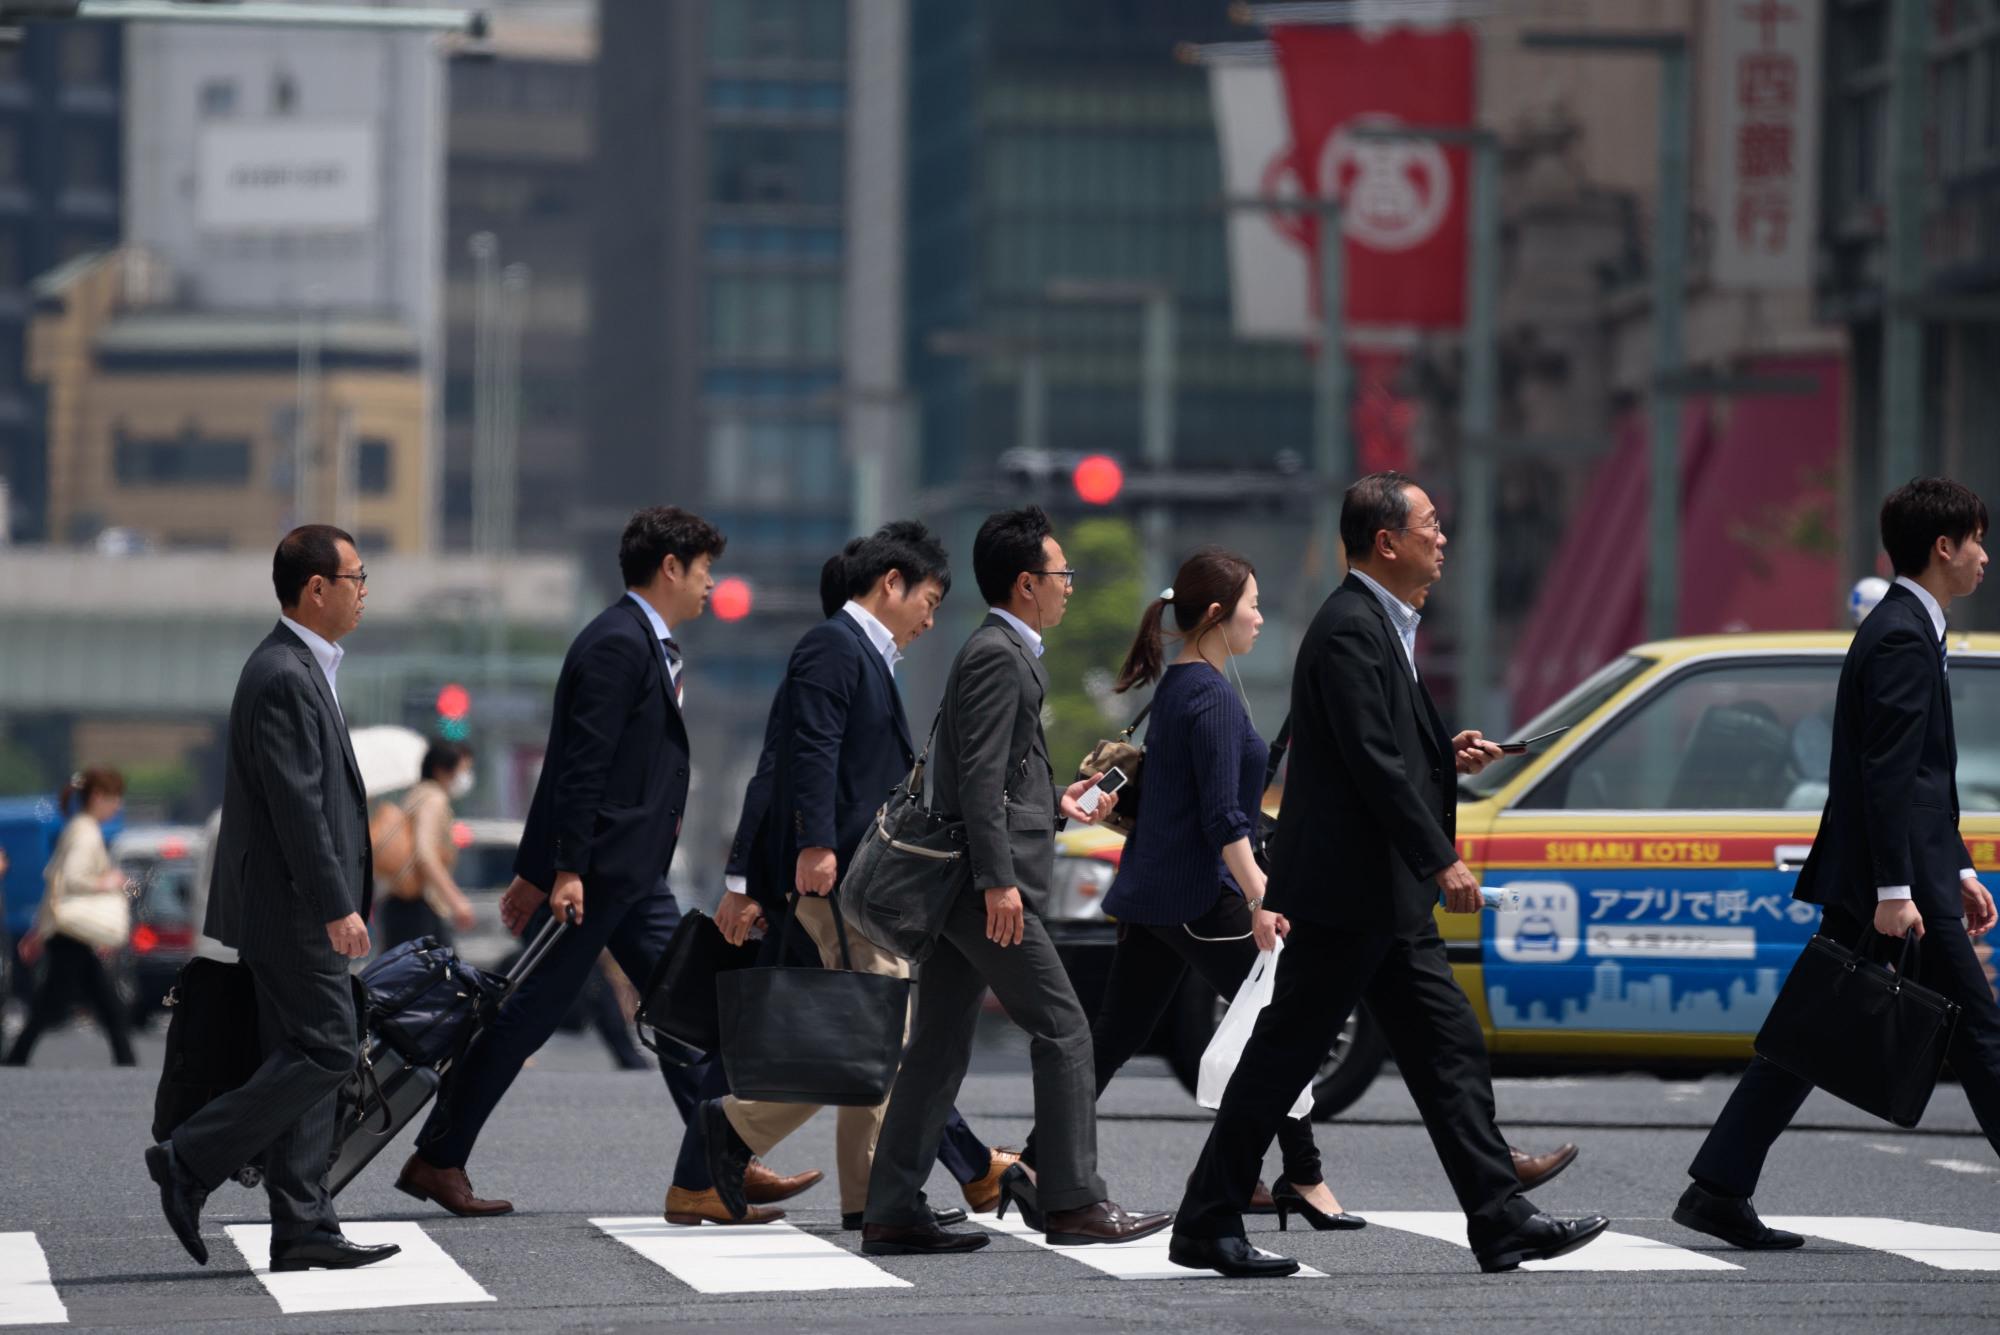 Mengenal Ikigai, Kaizen, & Keishan: Rahasia Orang Jepang Menghilangkan Kemalasan image